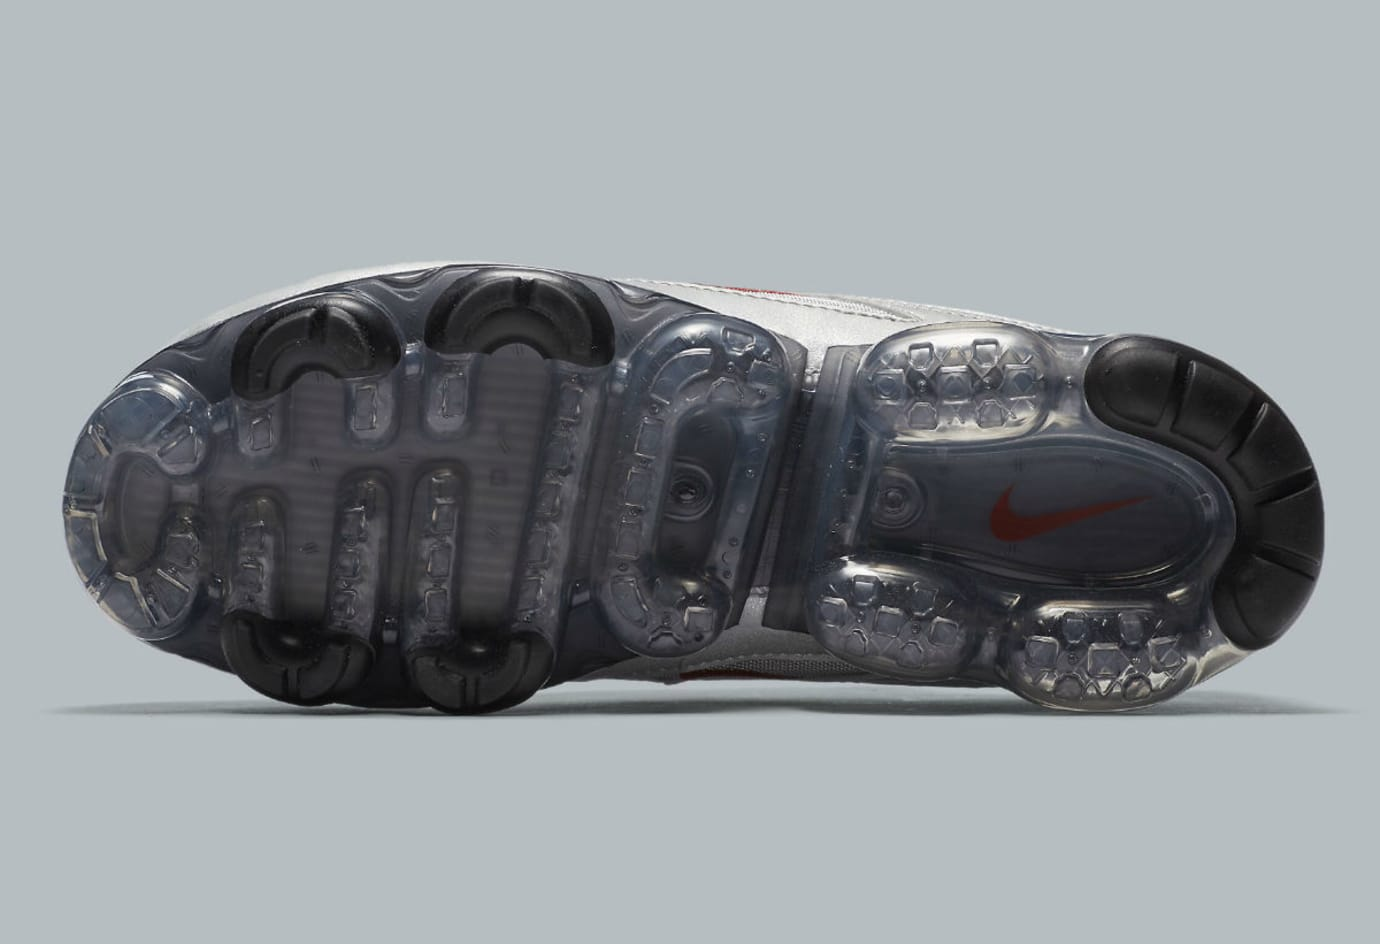 d8a557ba71b098 Nike Air VaporMax 97 Silver Bullet Release Date AJ7291-002 Sole